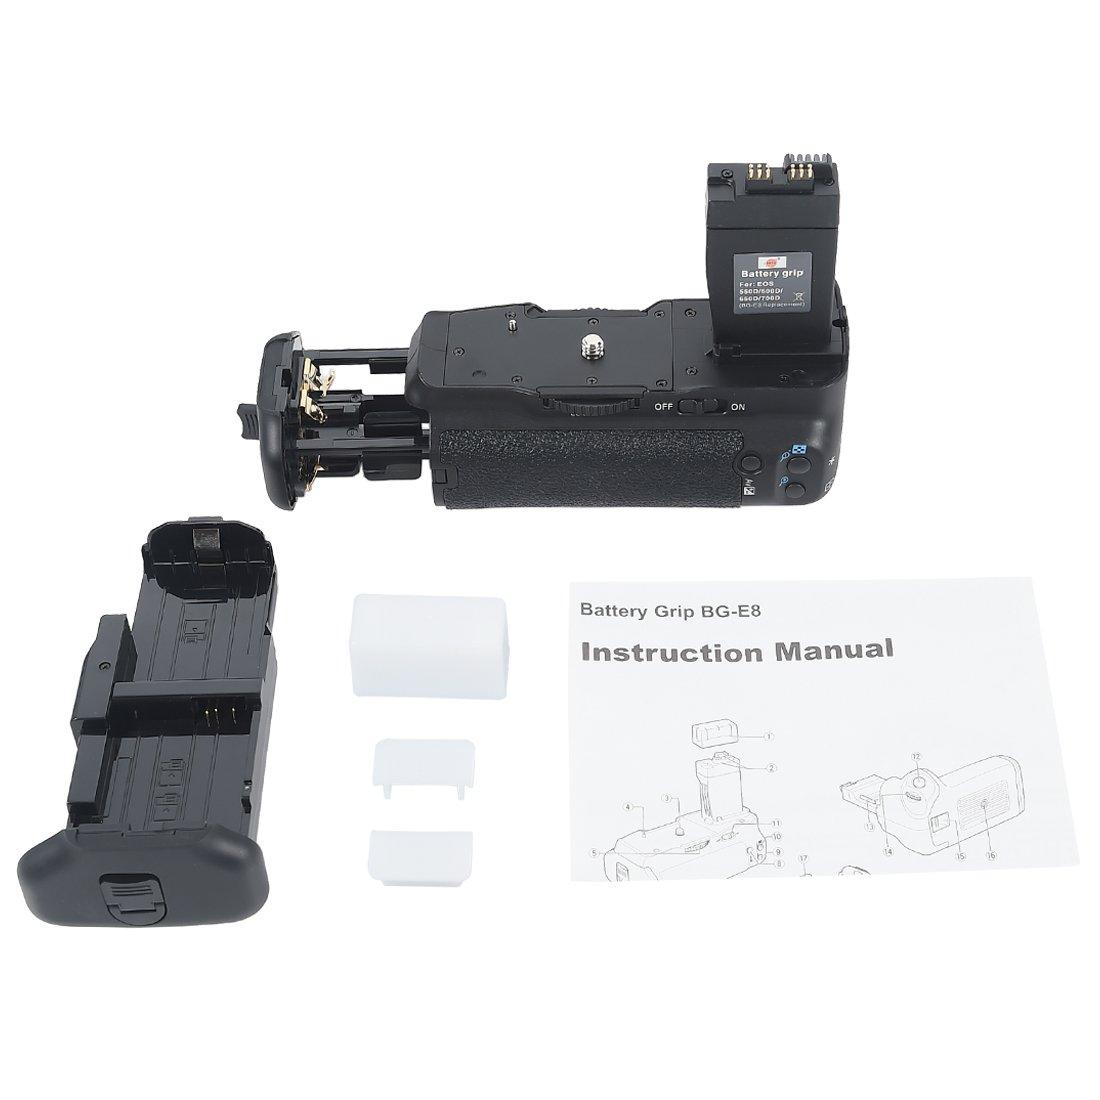 Pack de bater/ías para empu/ñadura de c/ámaras Canon EOS 550D y 600D DSTE BG-E8